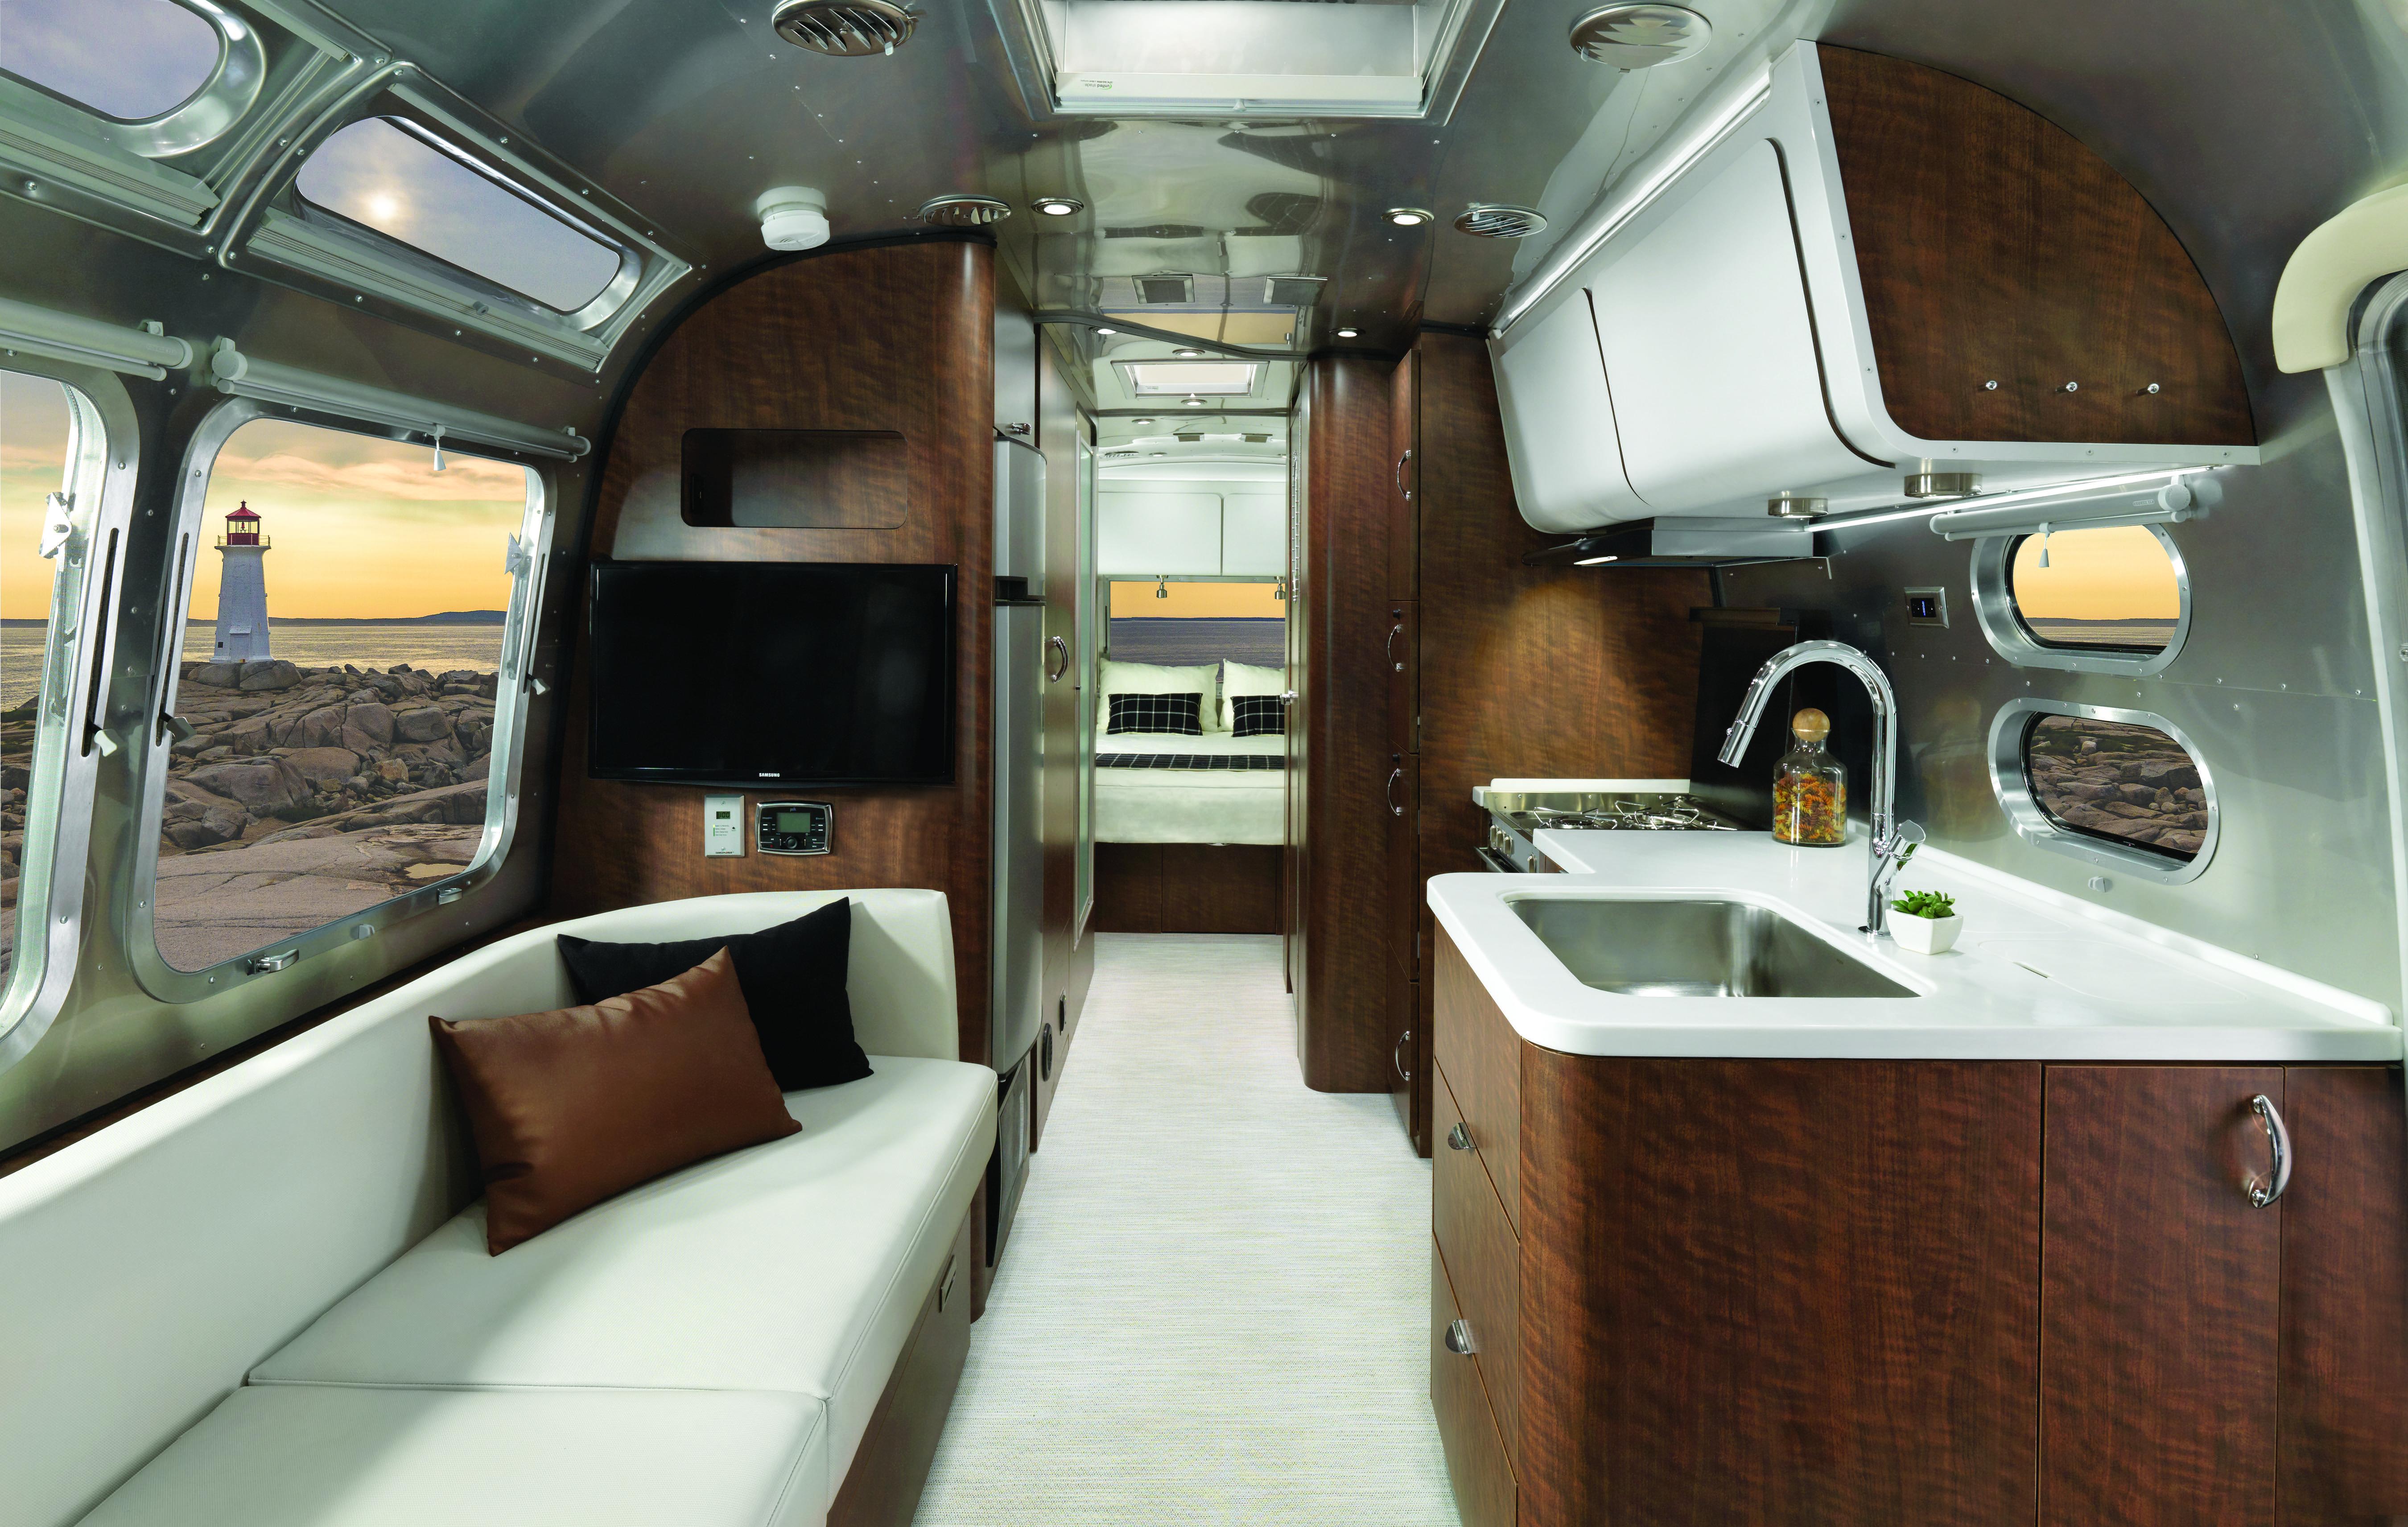 Airstream debuts new 'European inspired' travel trailer